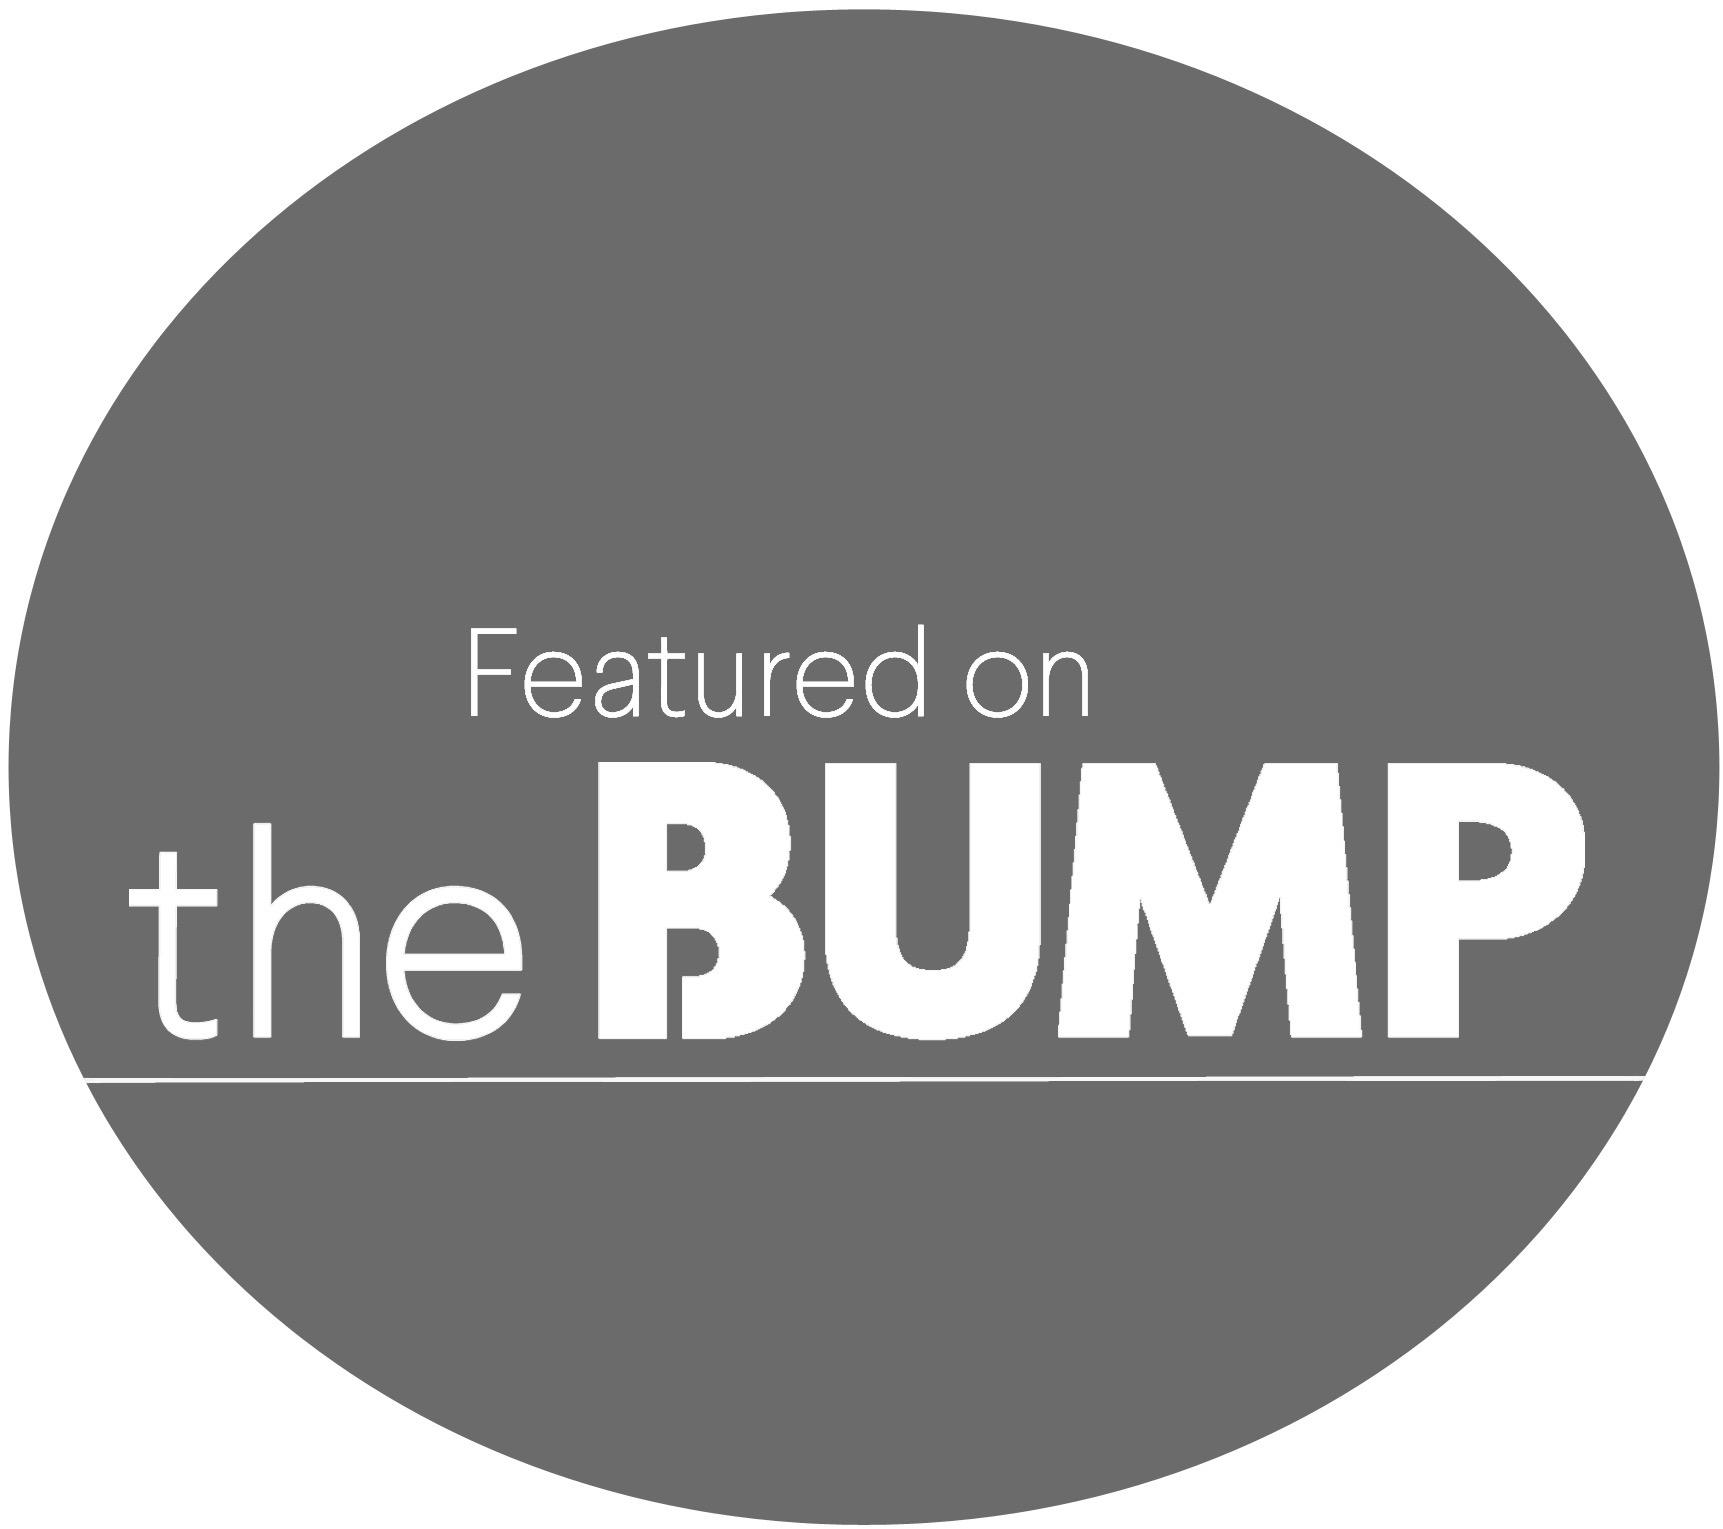 bump-featured-badge 2.jpg